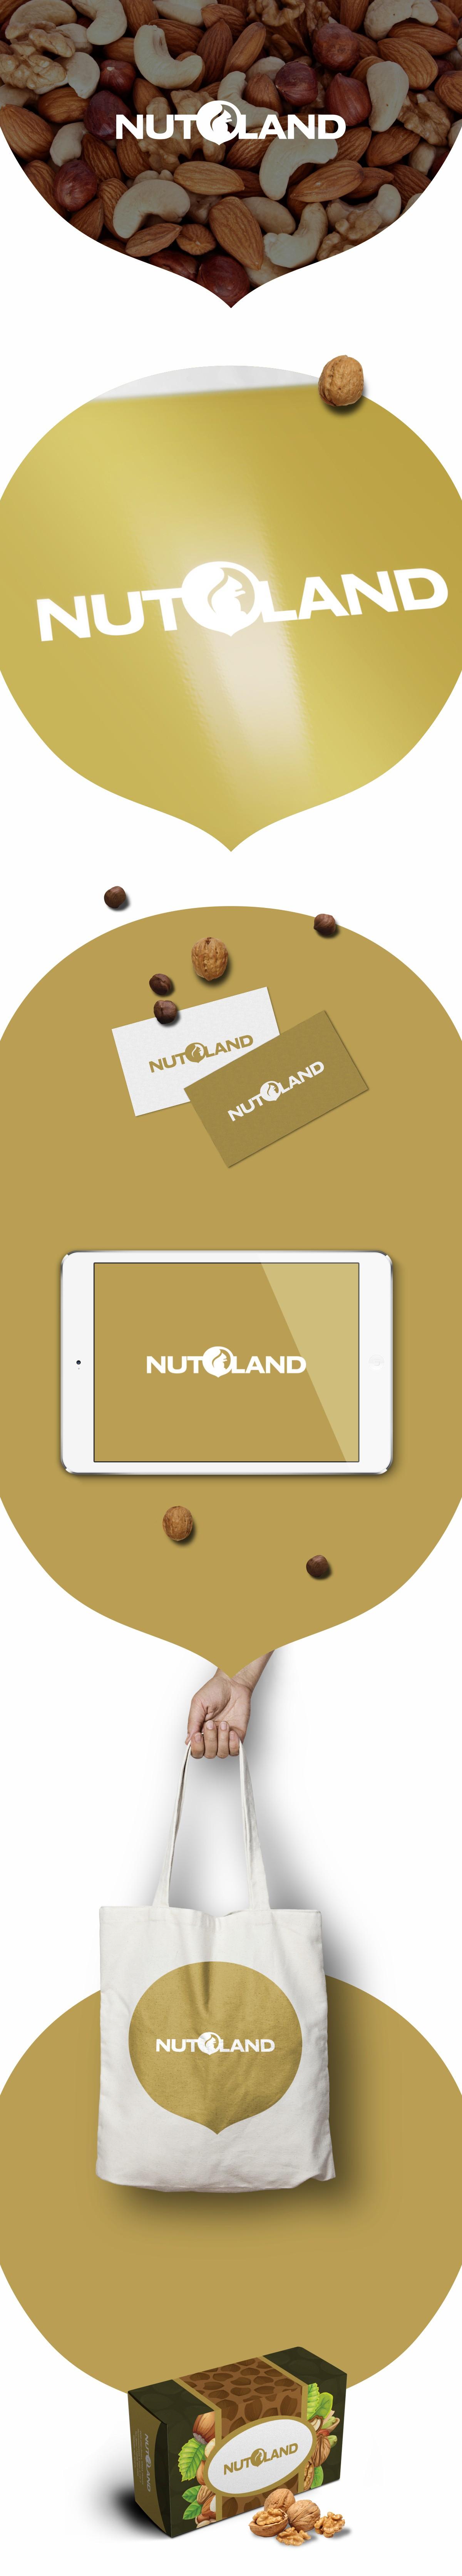 Nutland